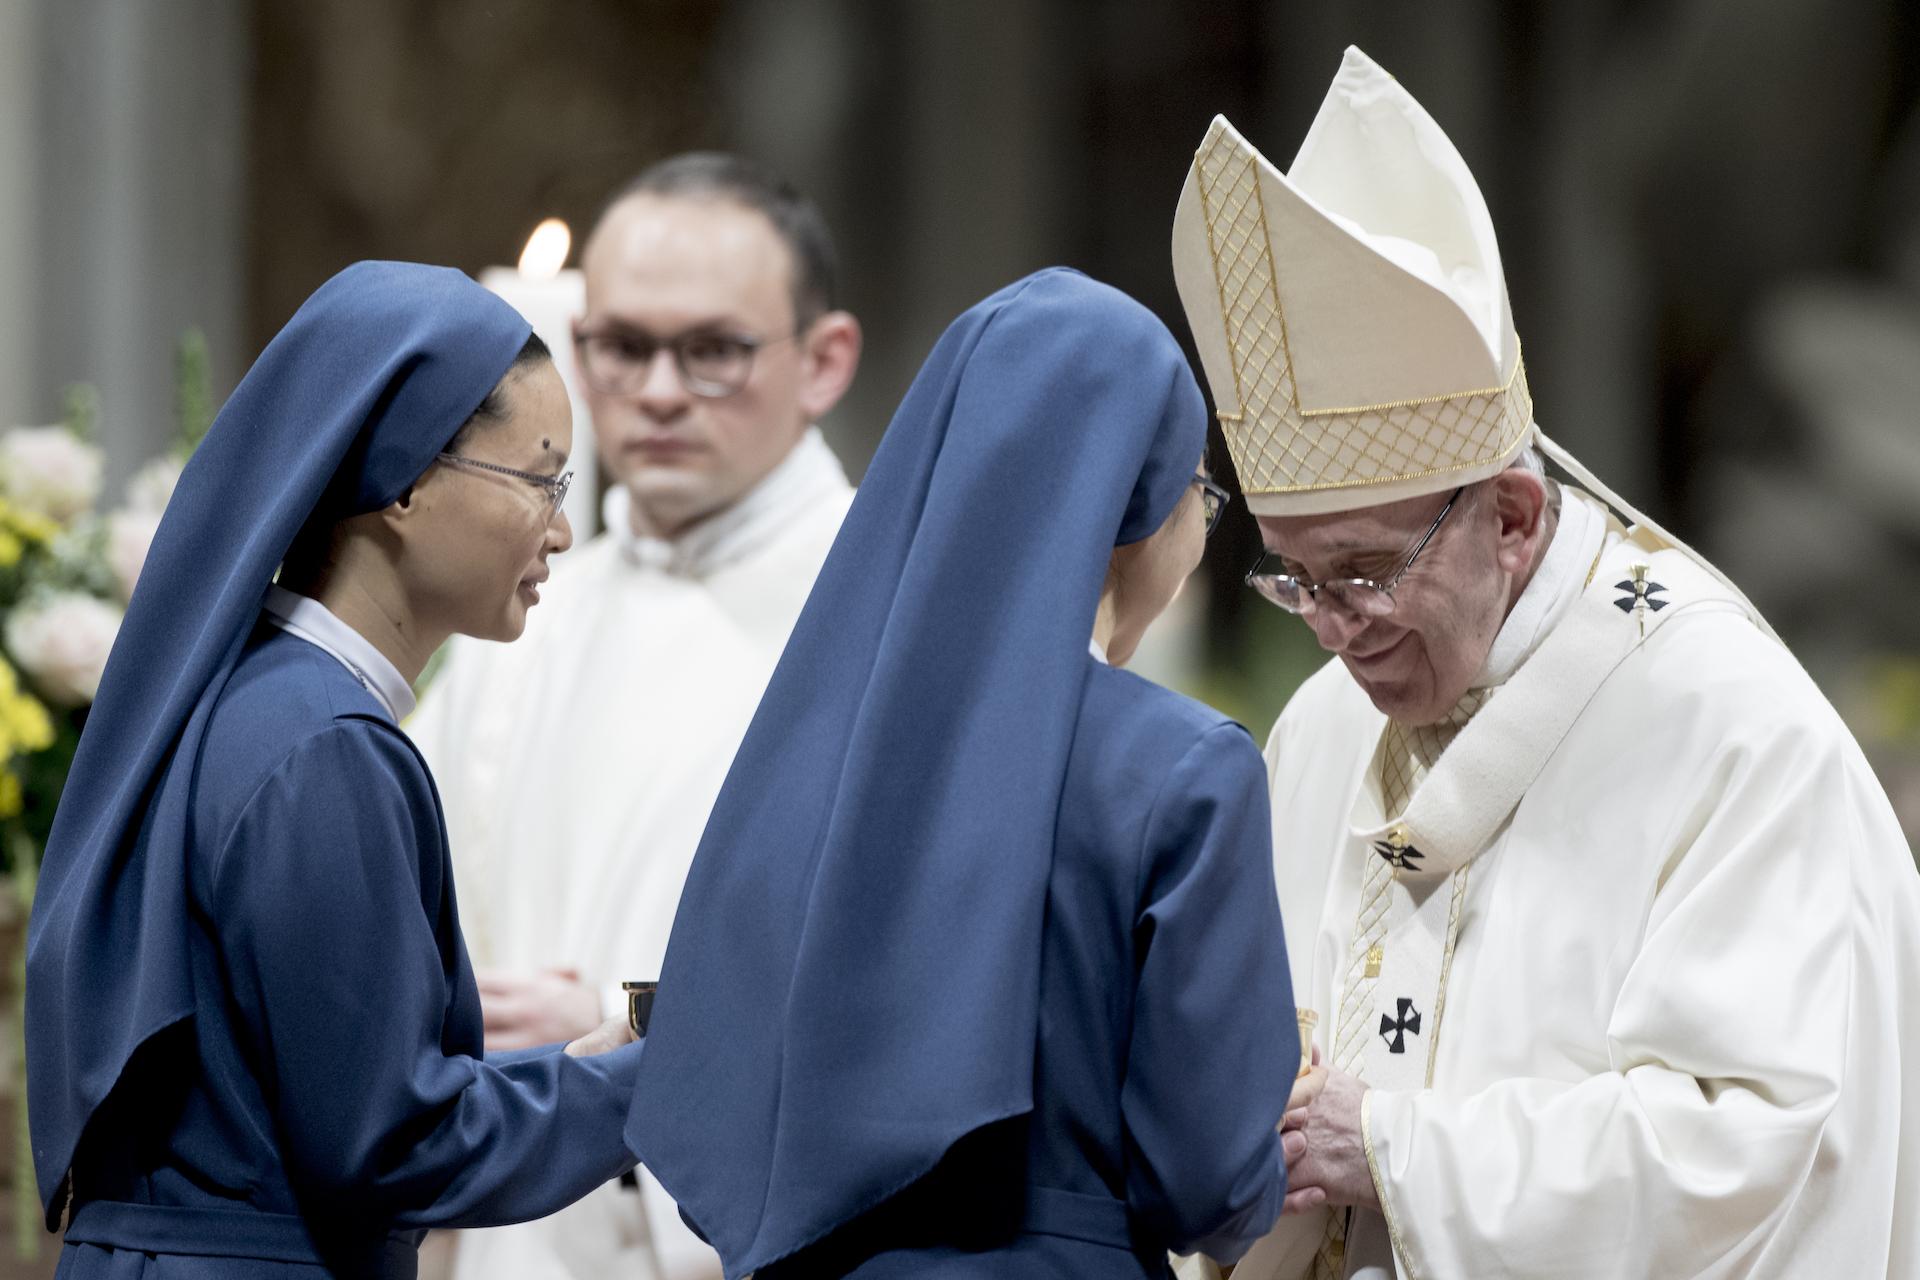 Priests coerce nuns into sex